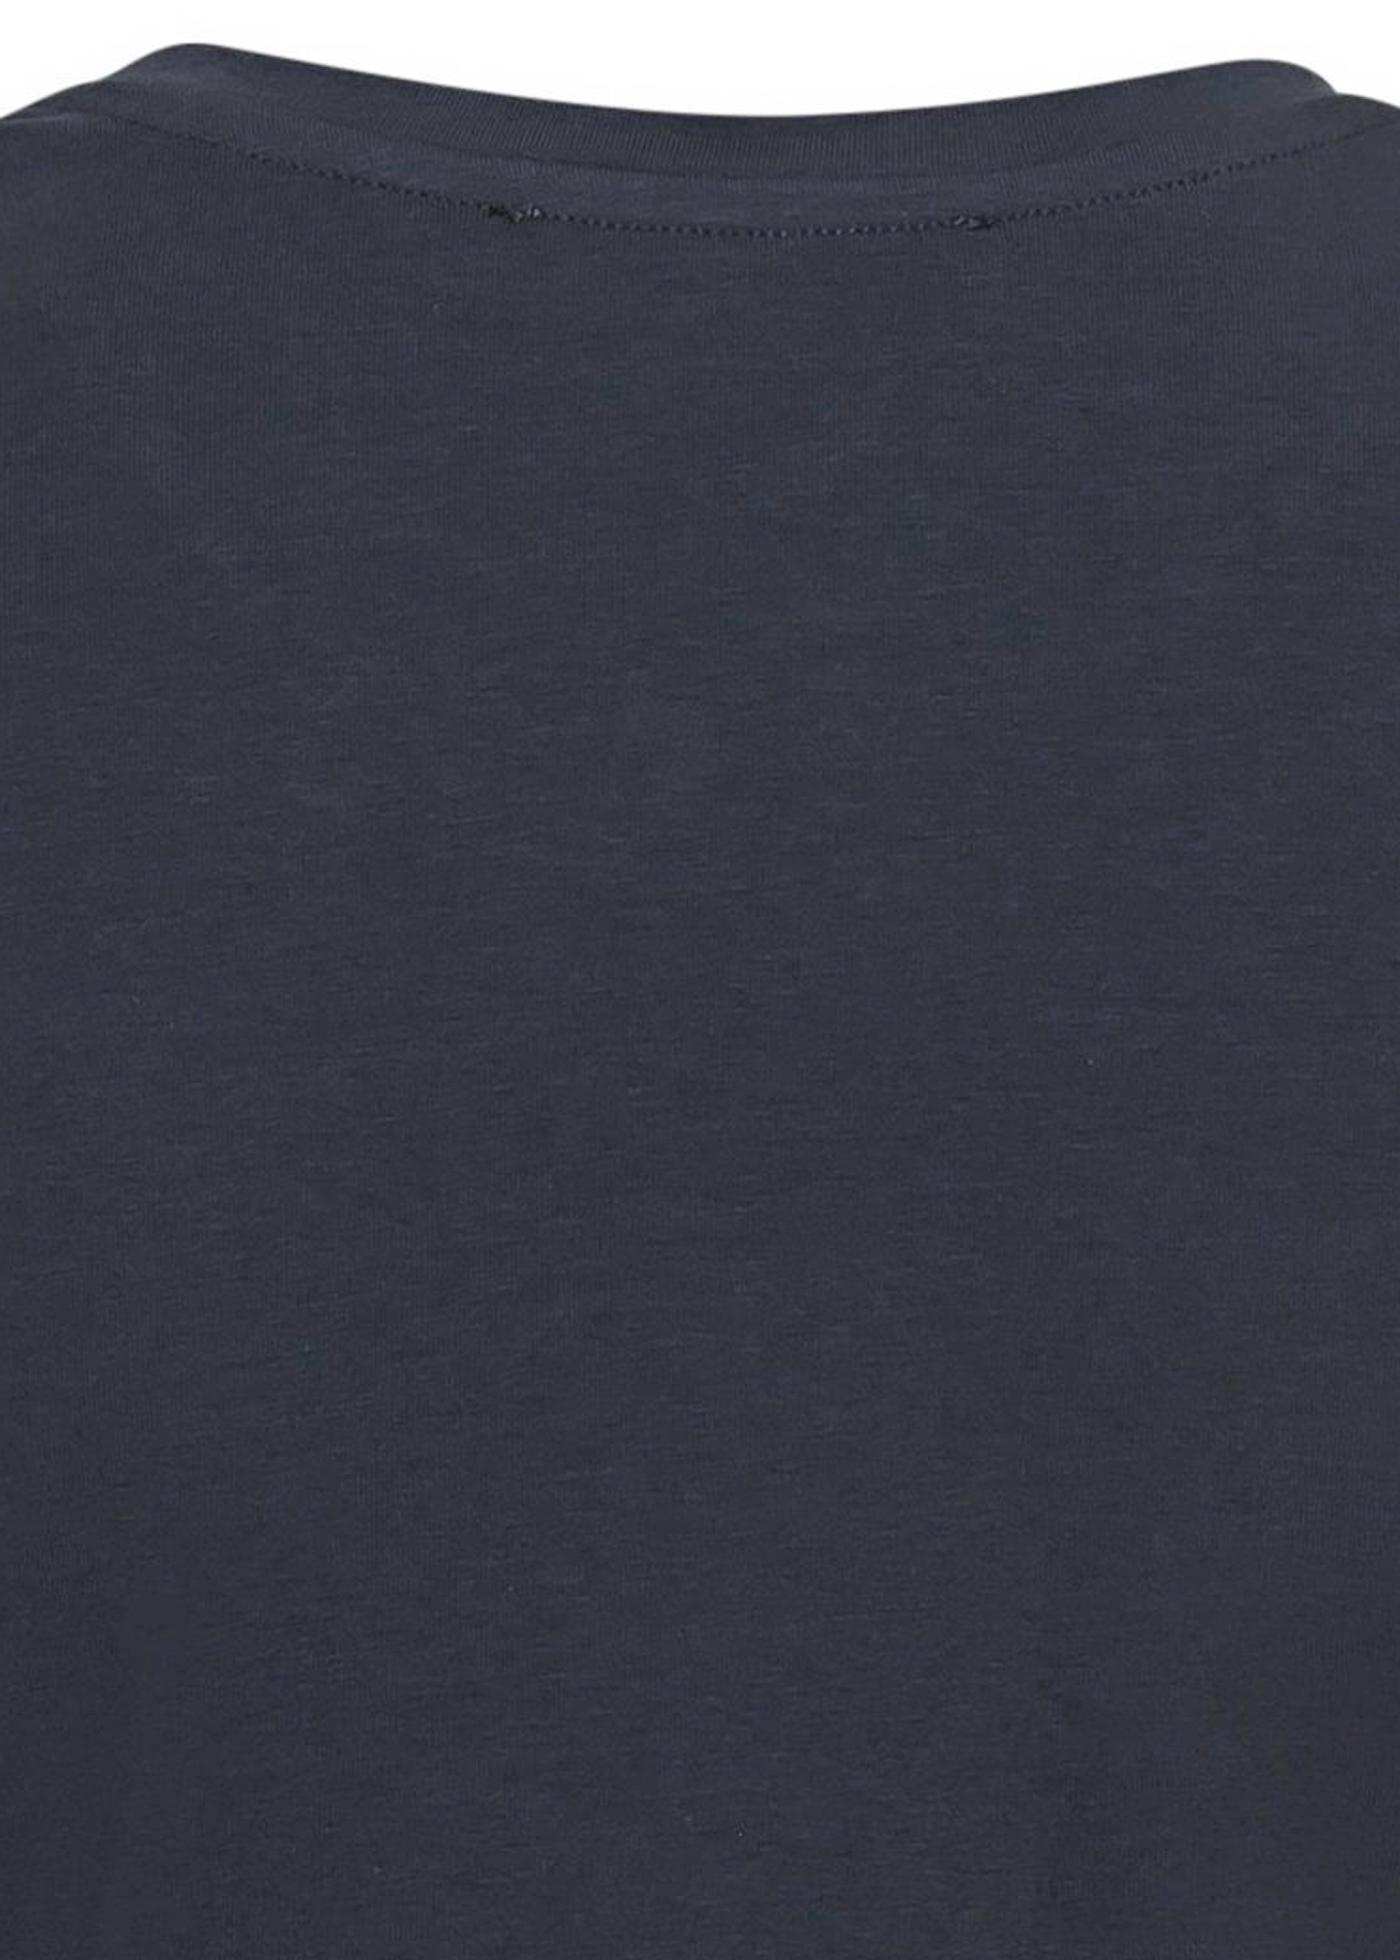 ALL TIME FAVORITES shirt image number 2